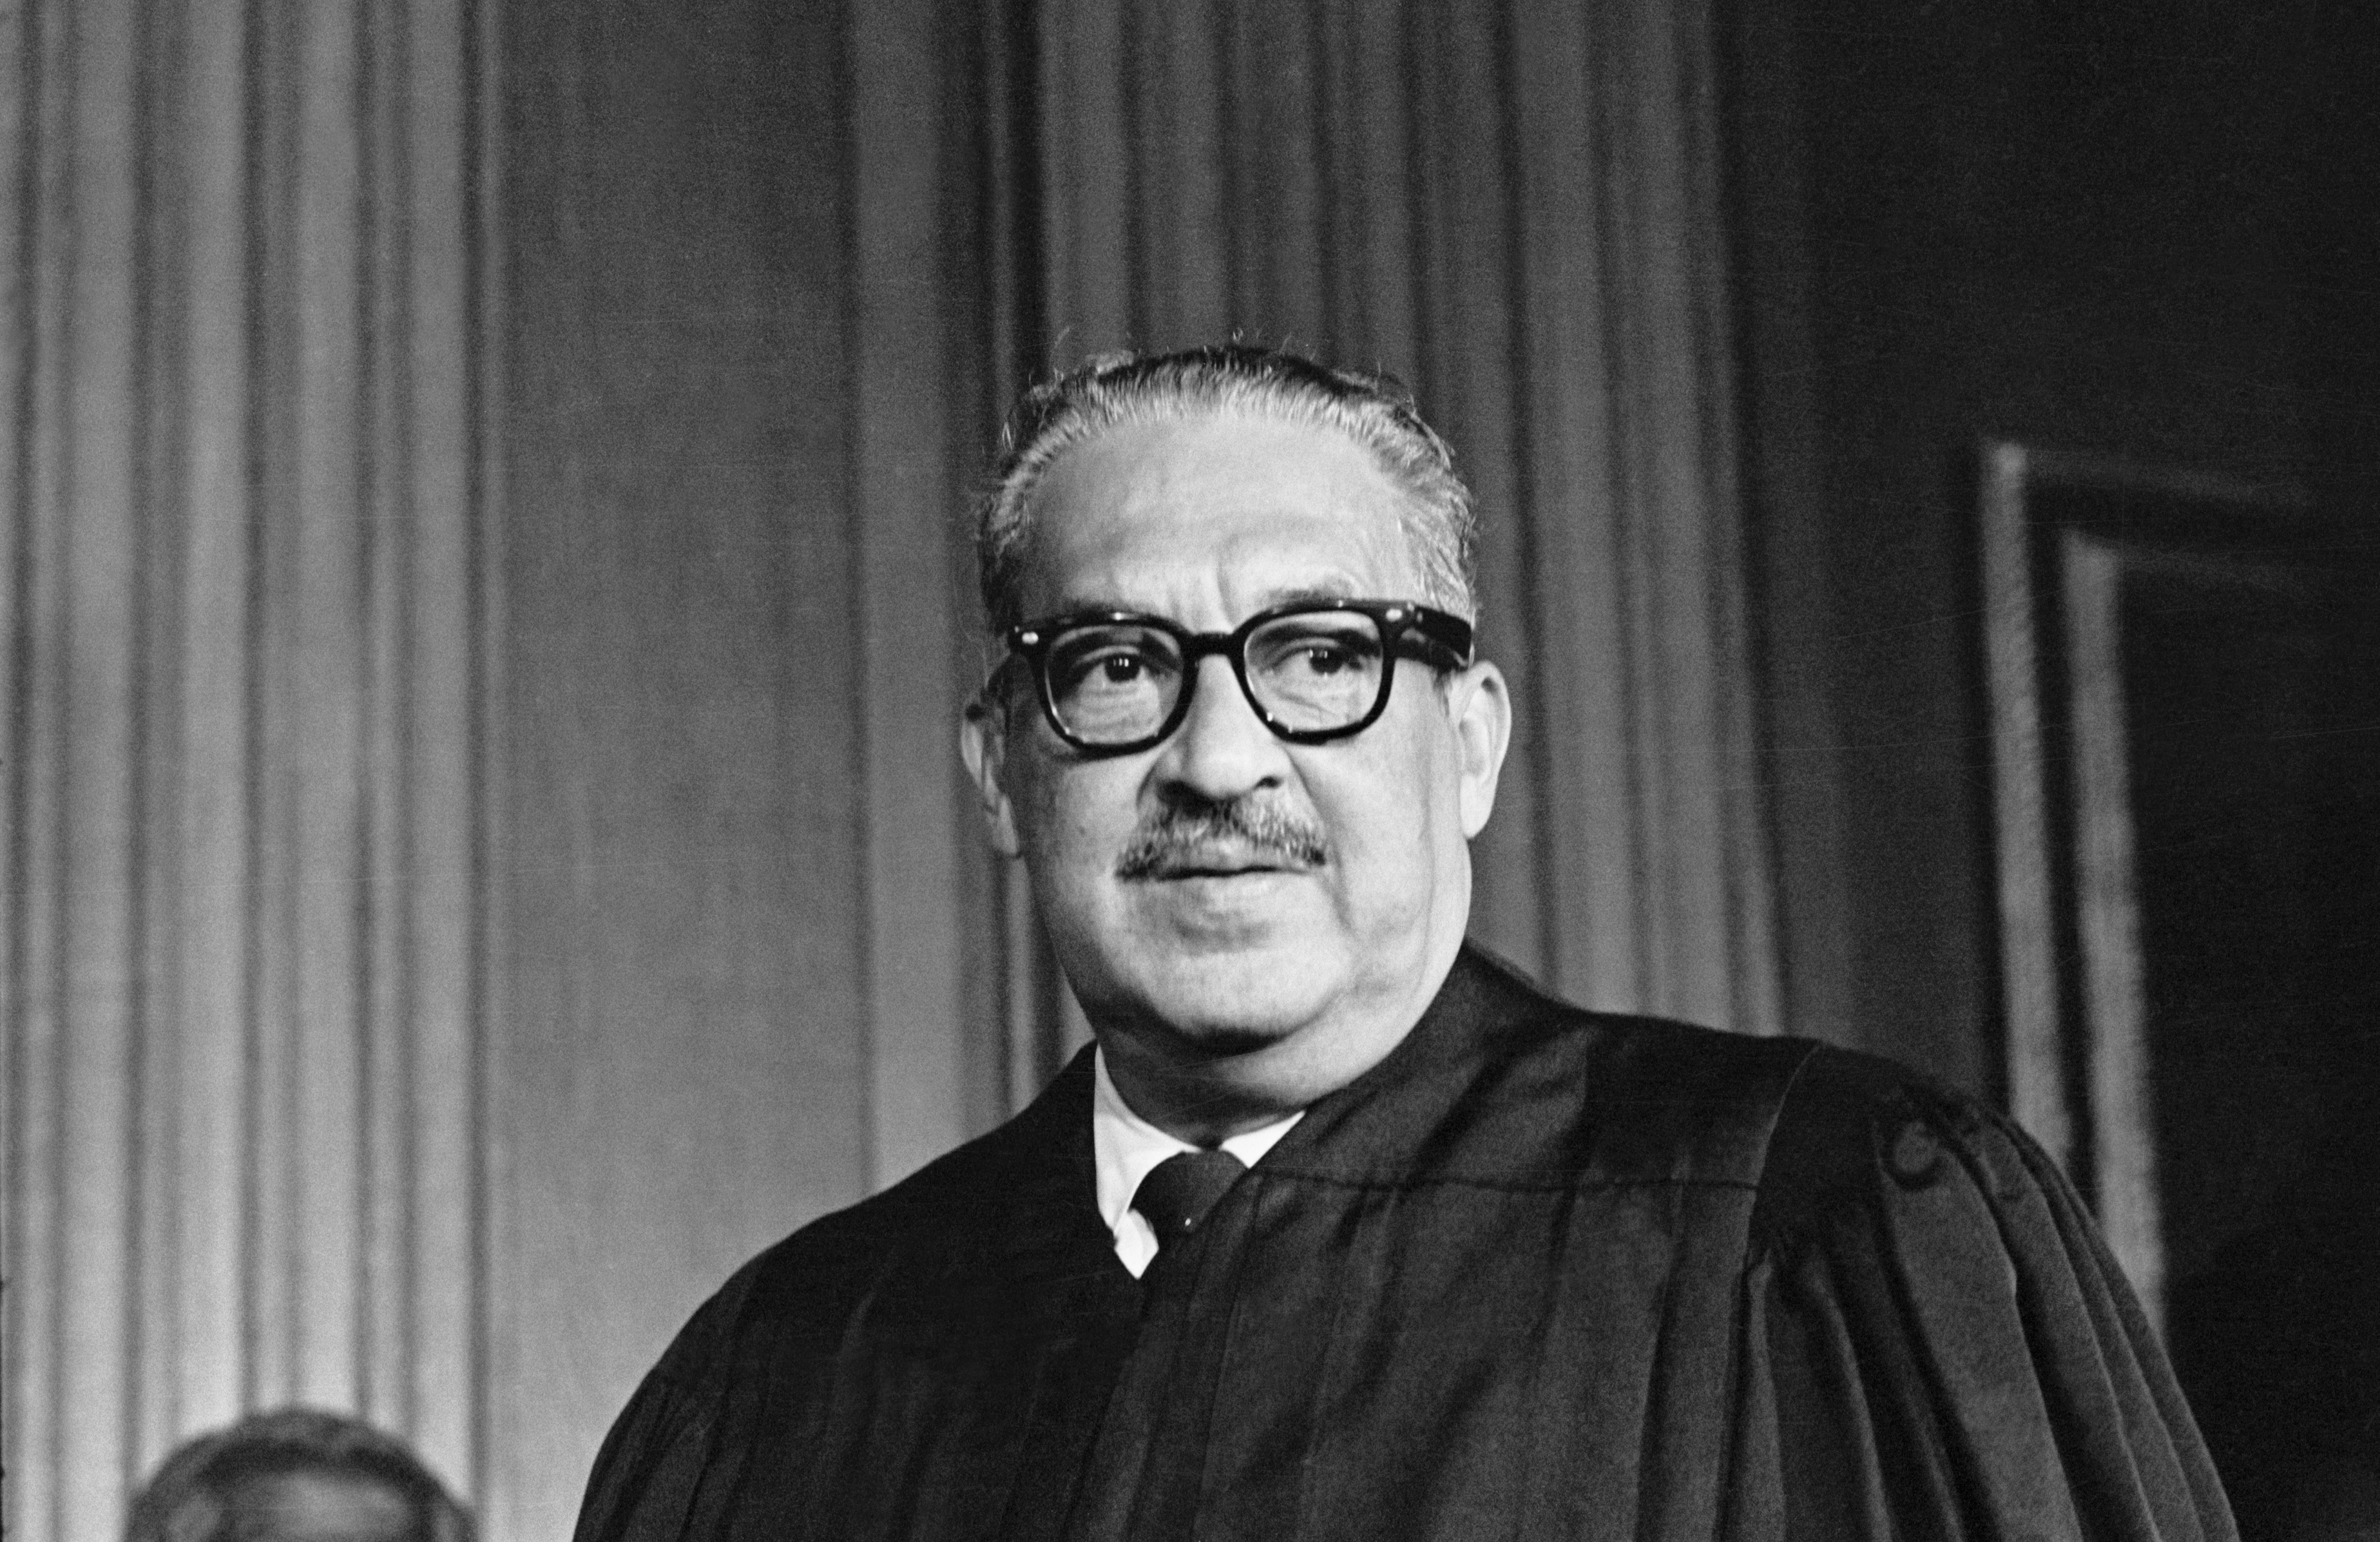 Supreme Court Justice Thurgood Marshall